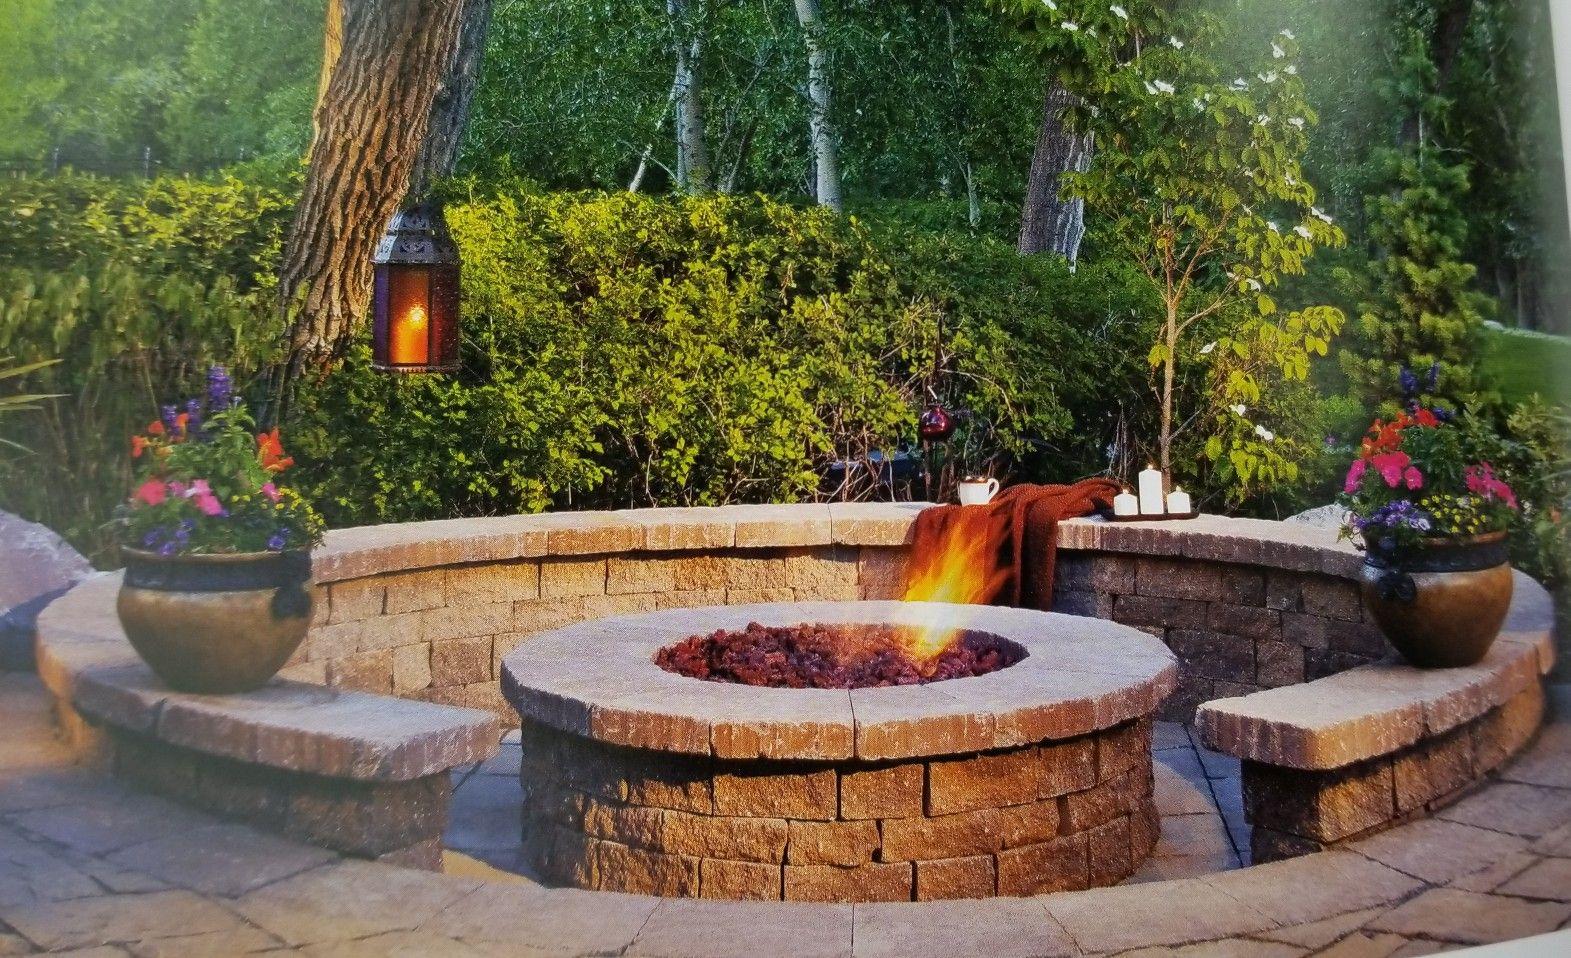 Pin by Rachel on yard and outdoors   Backyard fire, Sunken ...